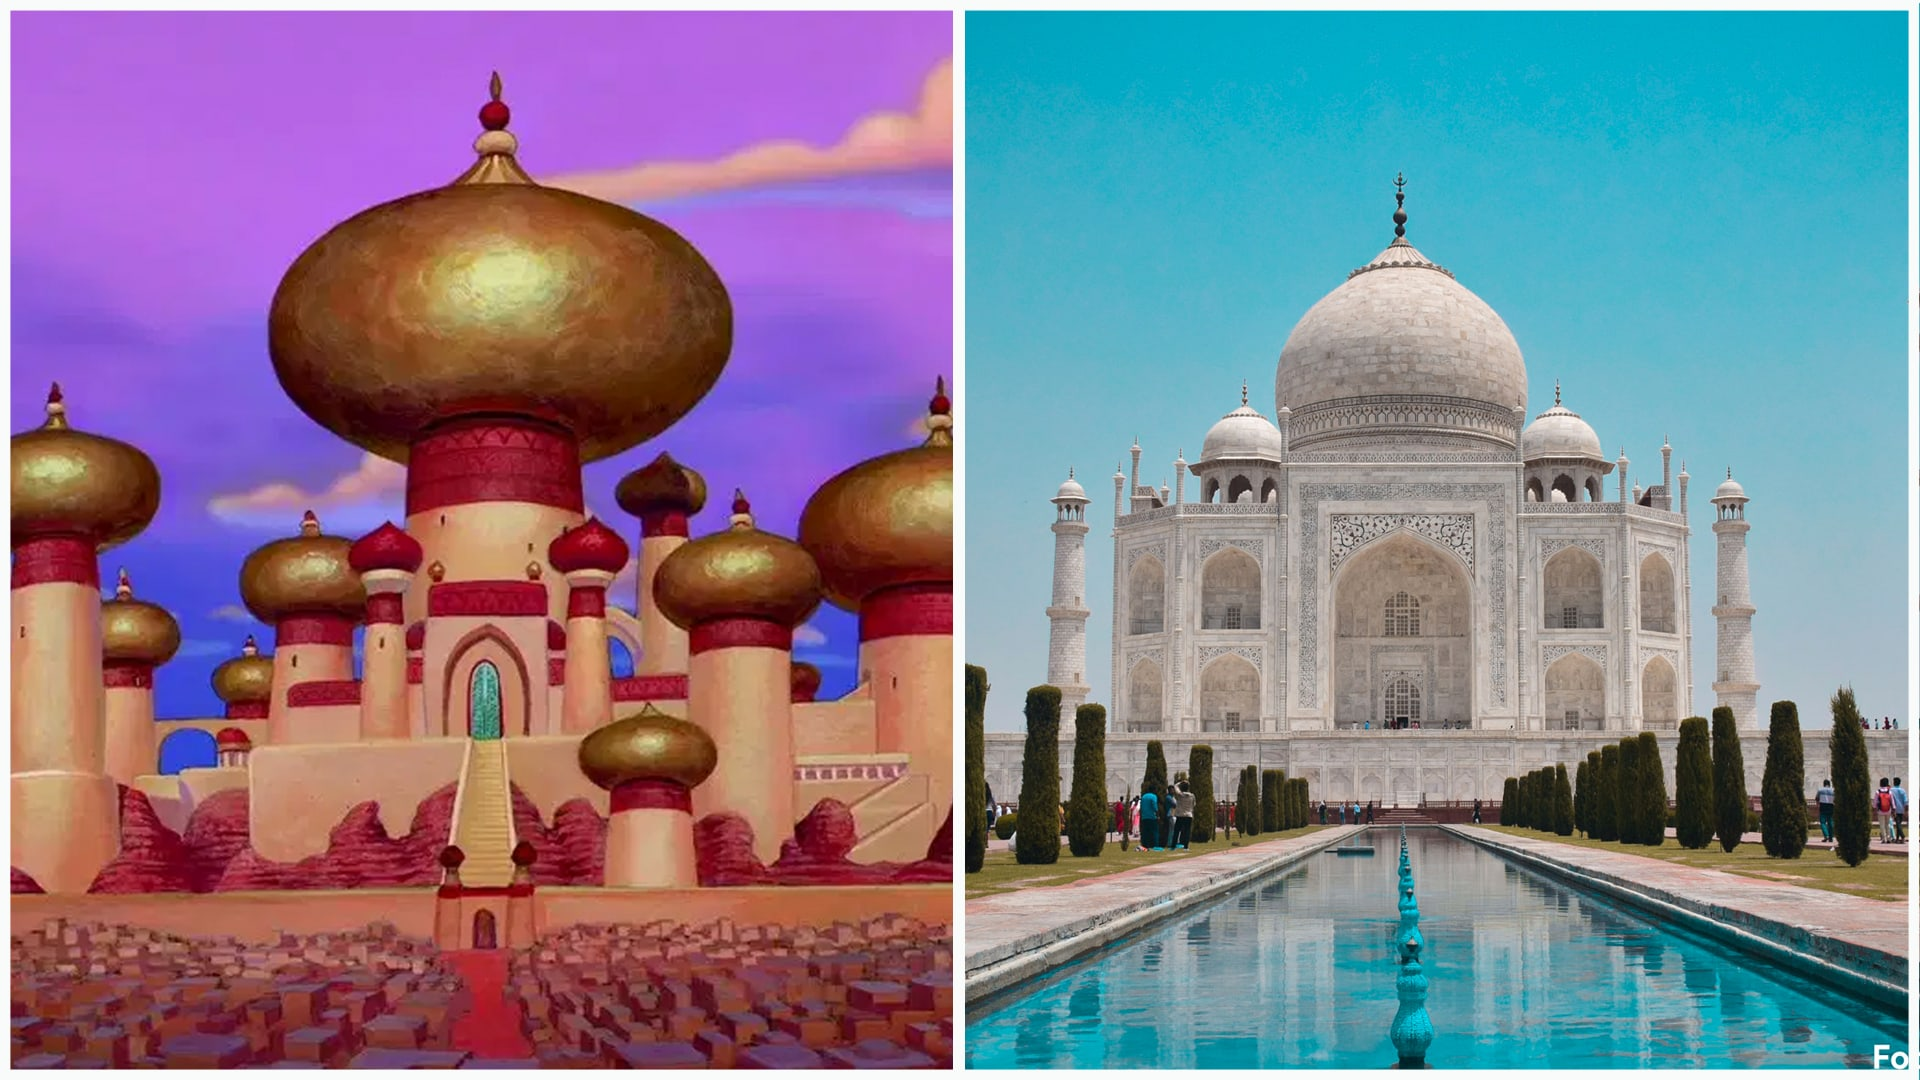 Aladdin - Taj Mahal, Índia